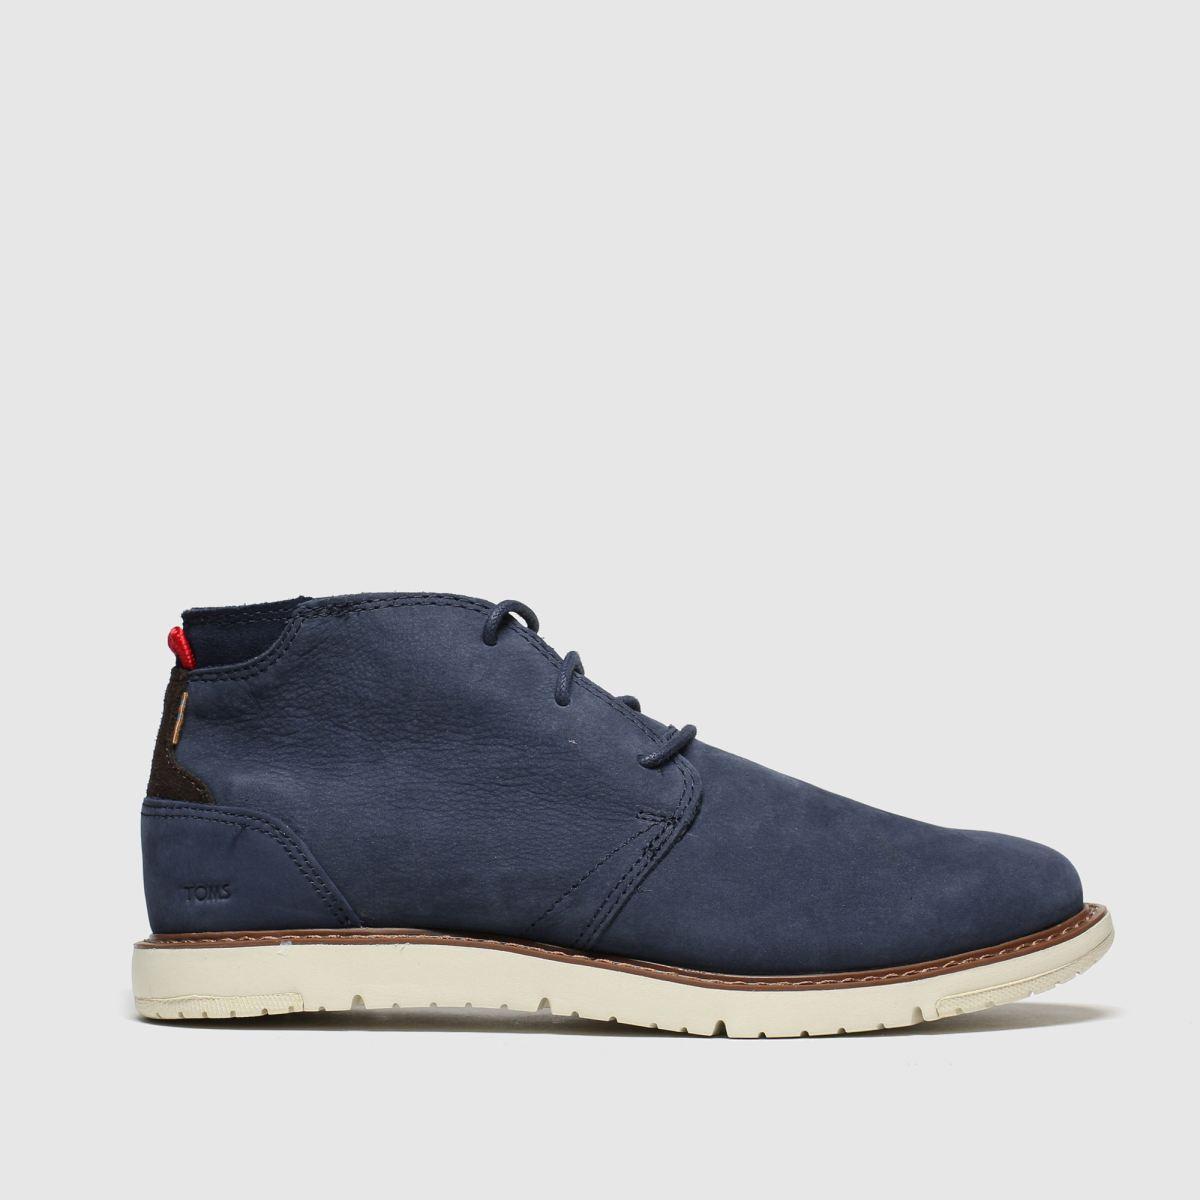 Toms Navy Navi Boots